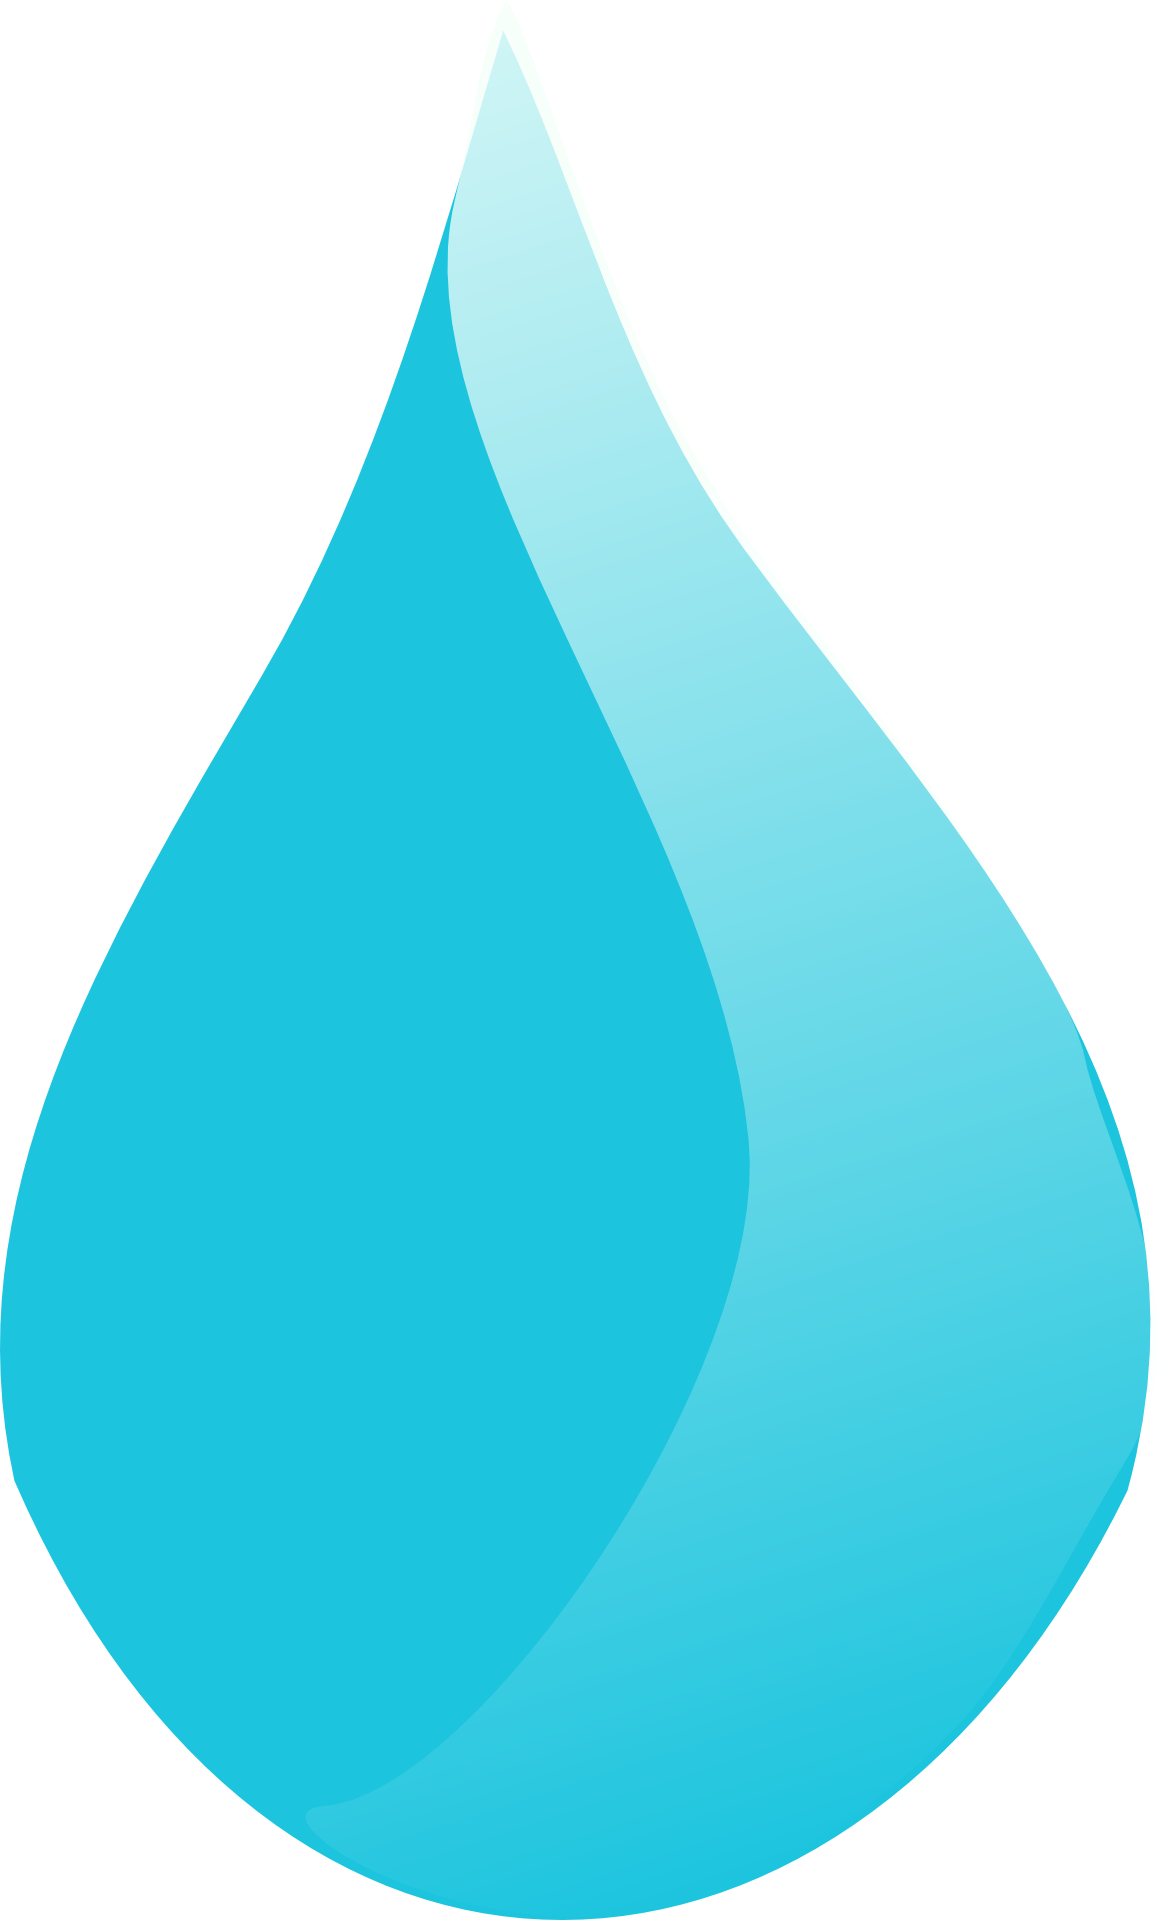 Teardrop Template - Clipart library. Water drop, rain drop,blue, liquid, teardrop ,cartoon vector